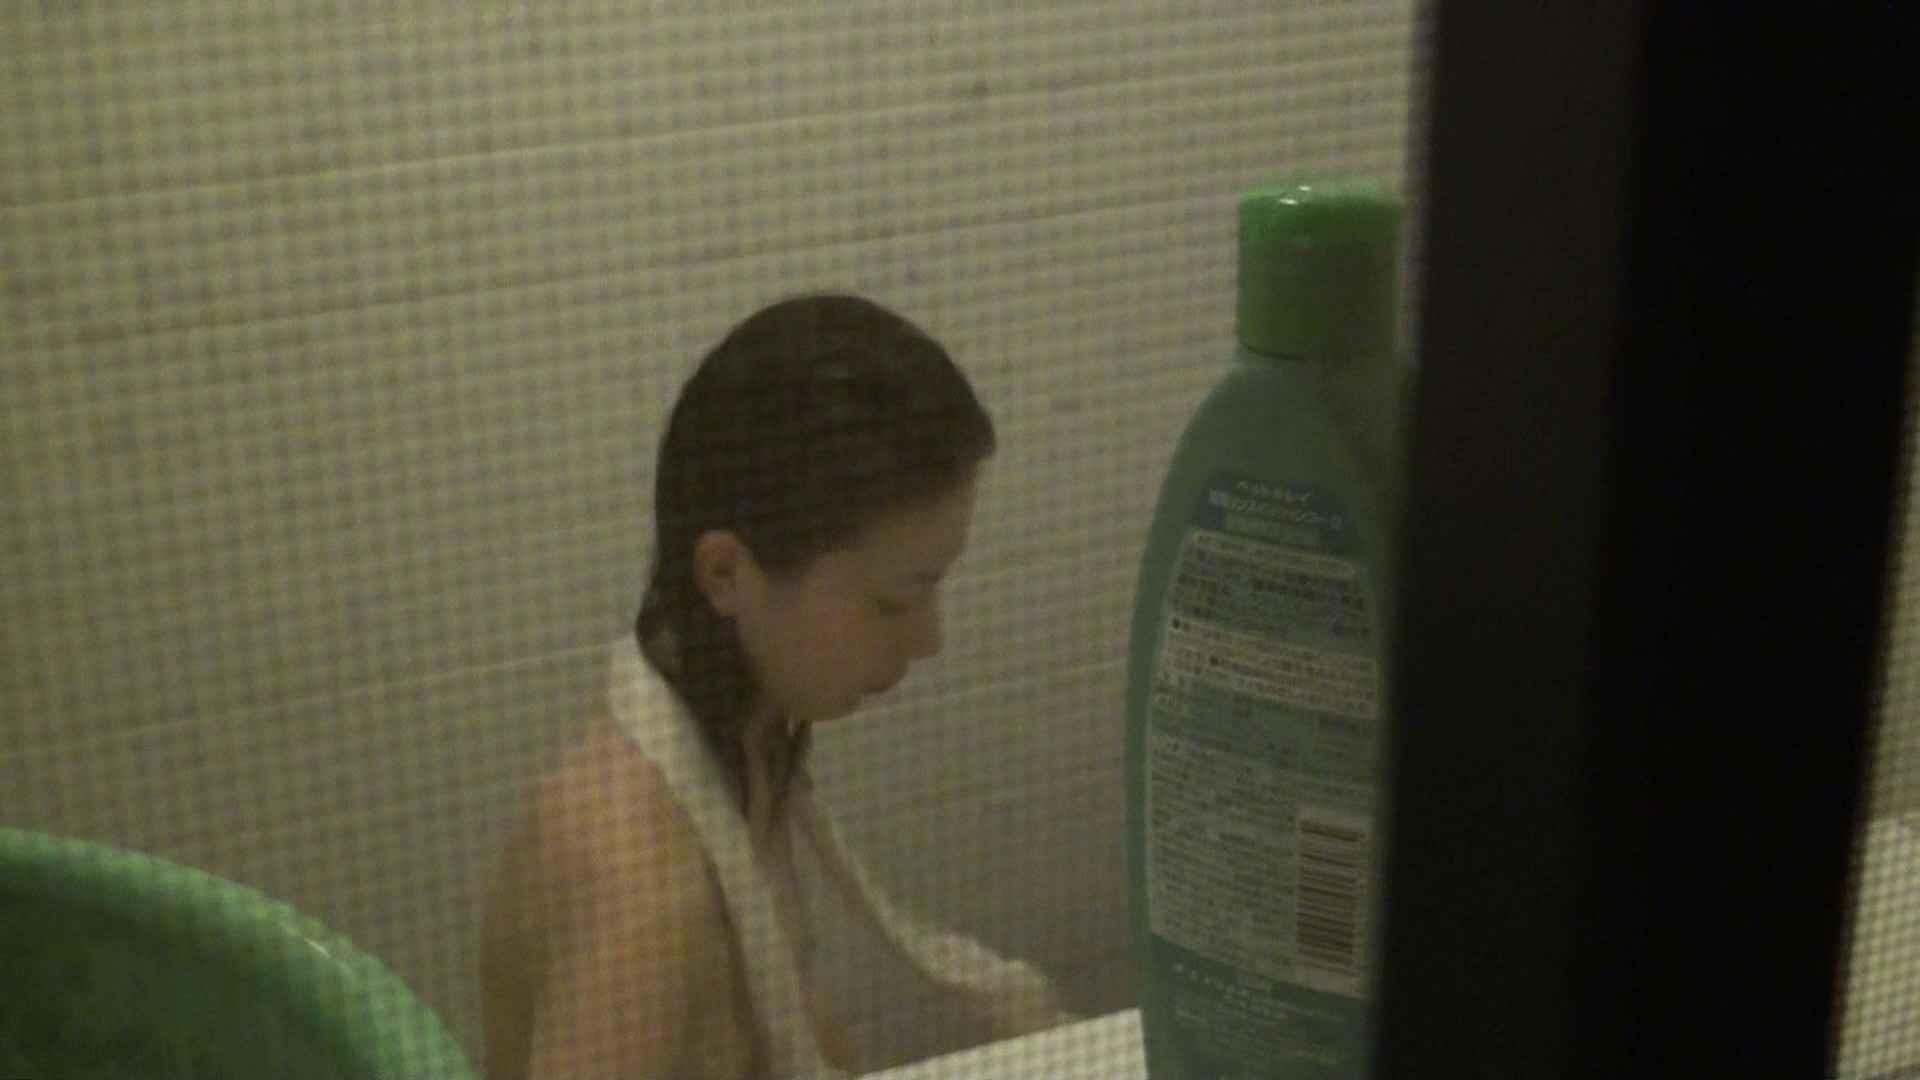 vol.06顔を洗い流す極上お女市さんの裸体をハイビジョンで!風呂上り着替え必見! 民家 スケベ動画紹介 68画像 5